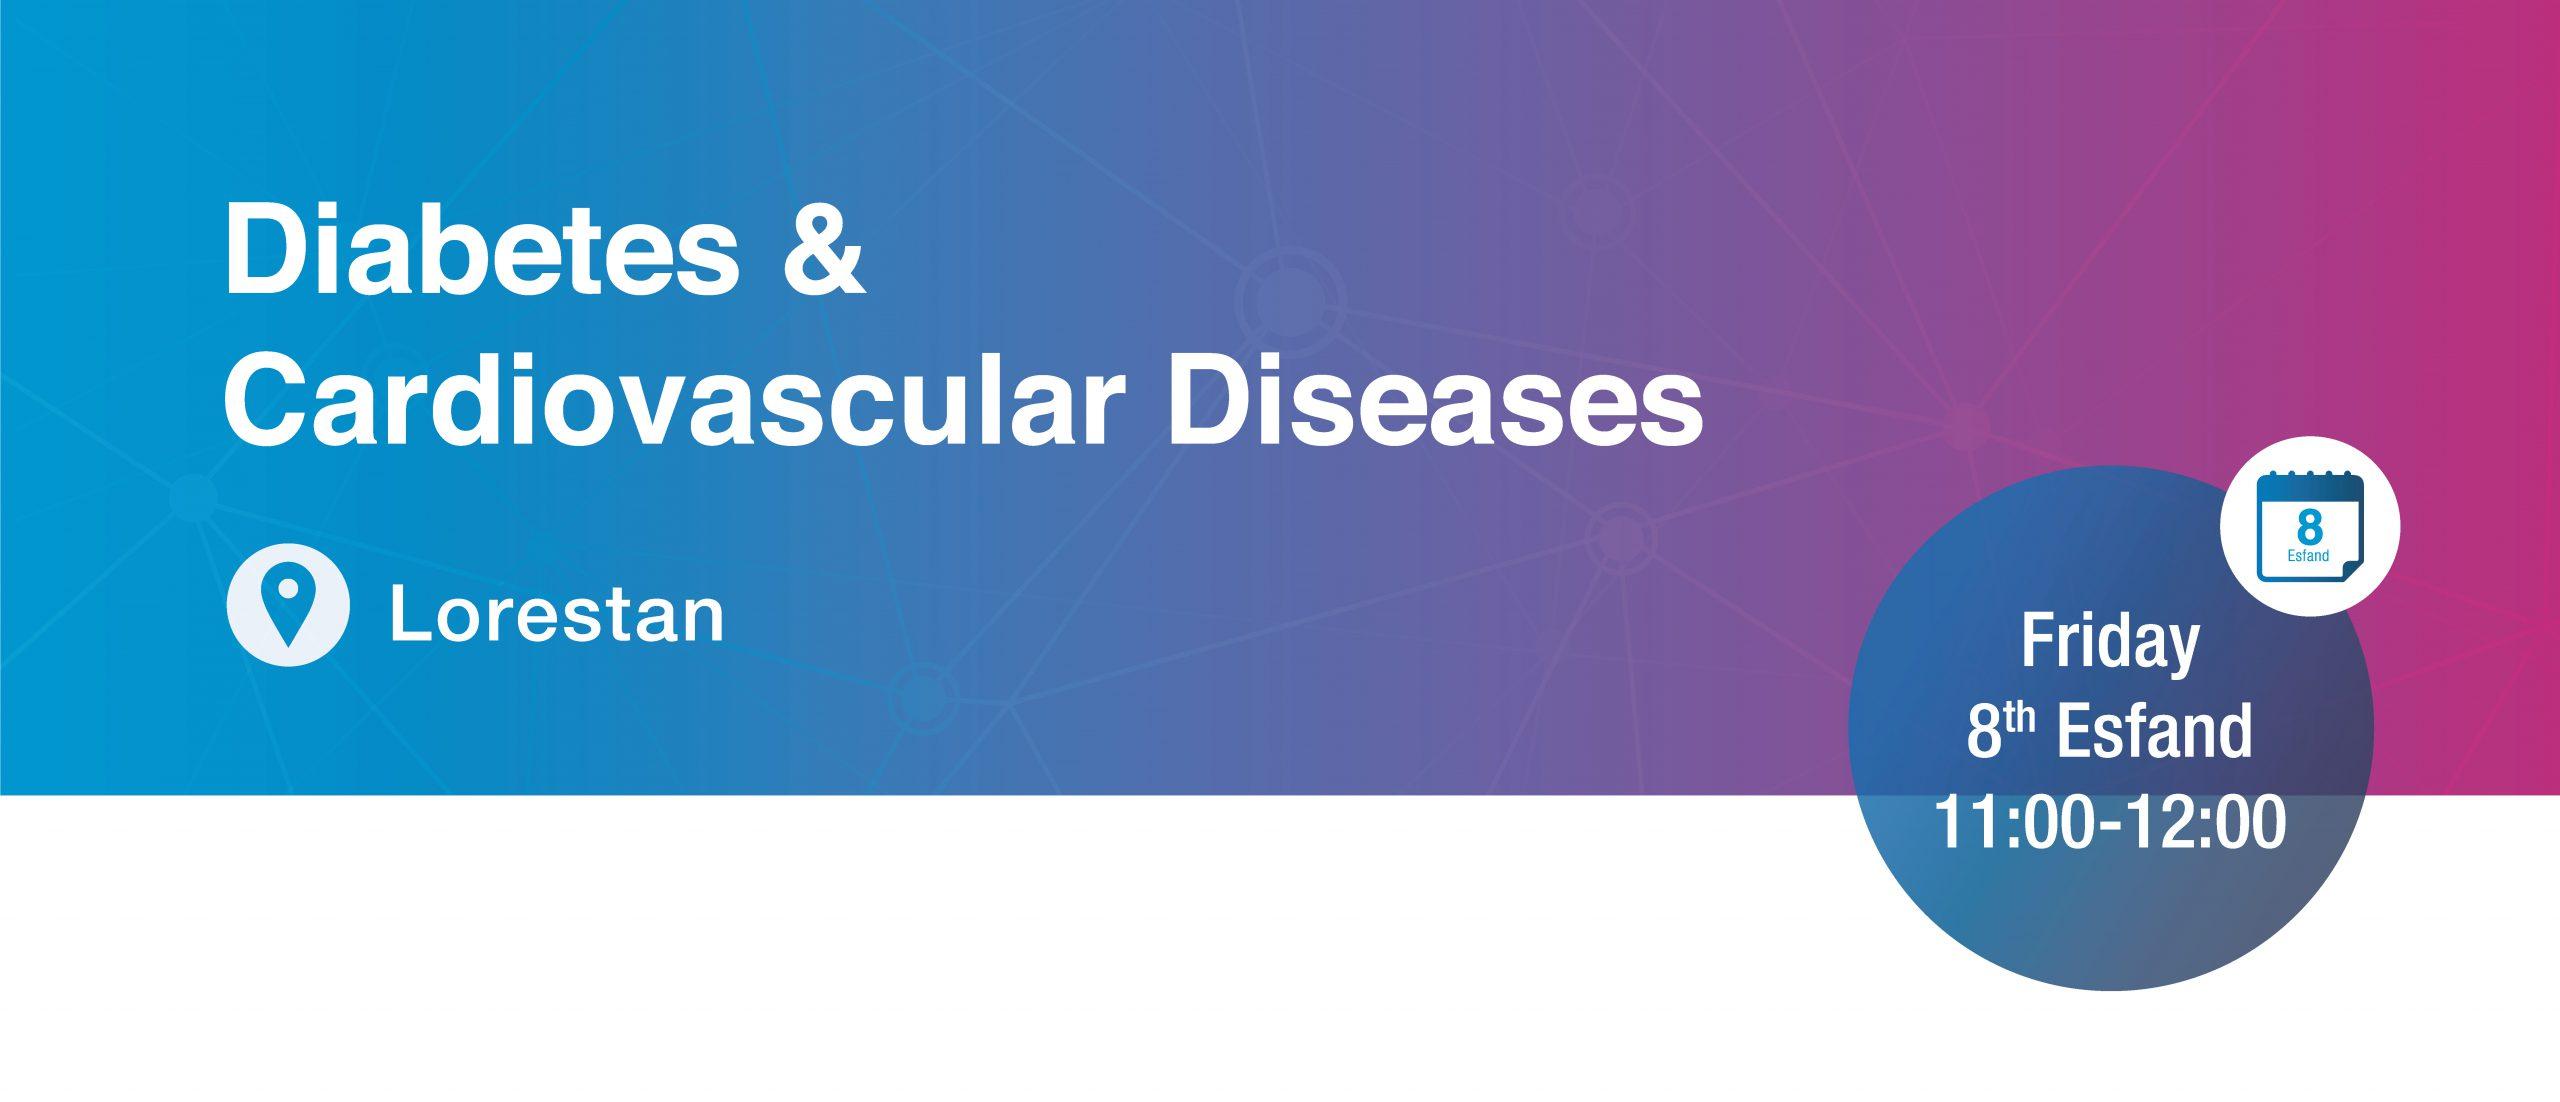 Diabetes & Cardiovascular Diseases